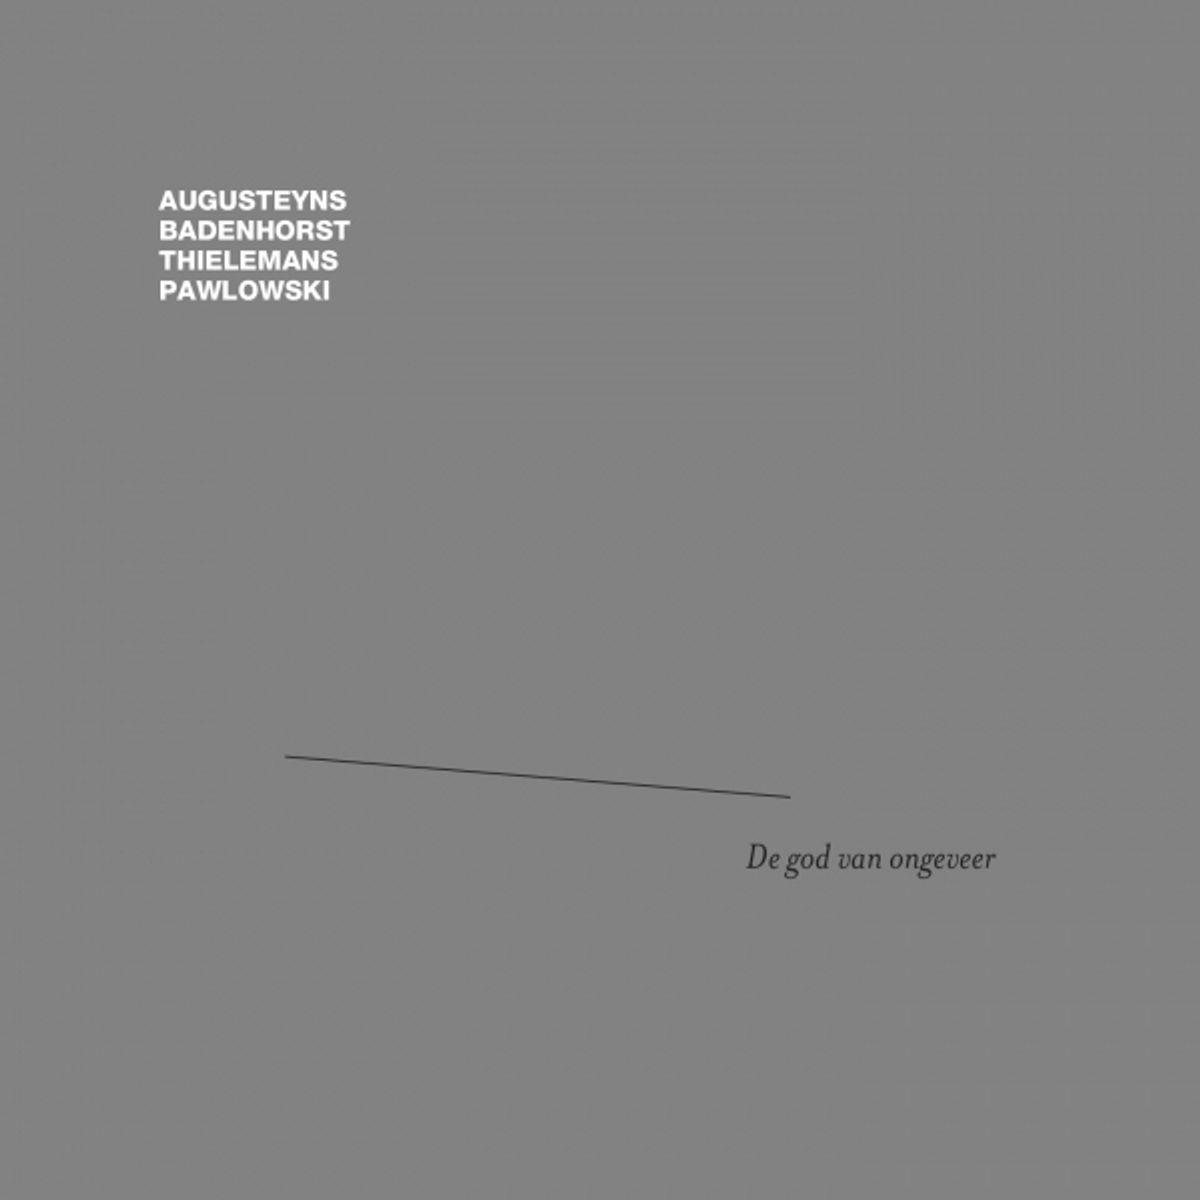 Augusteyns / Badenhorst / Thielemans / Pawlowski - 'De God Van Ongeveer'